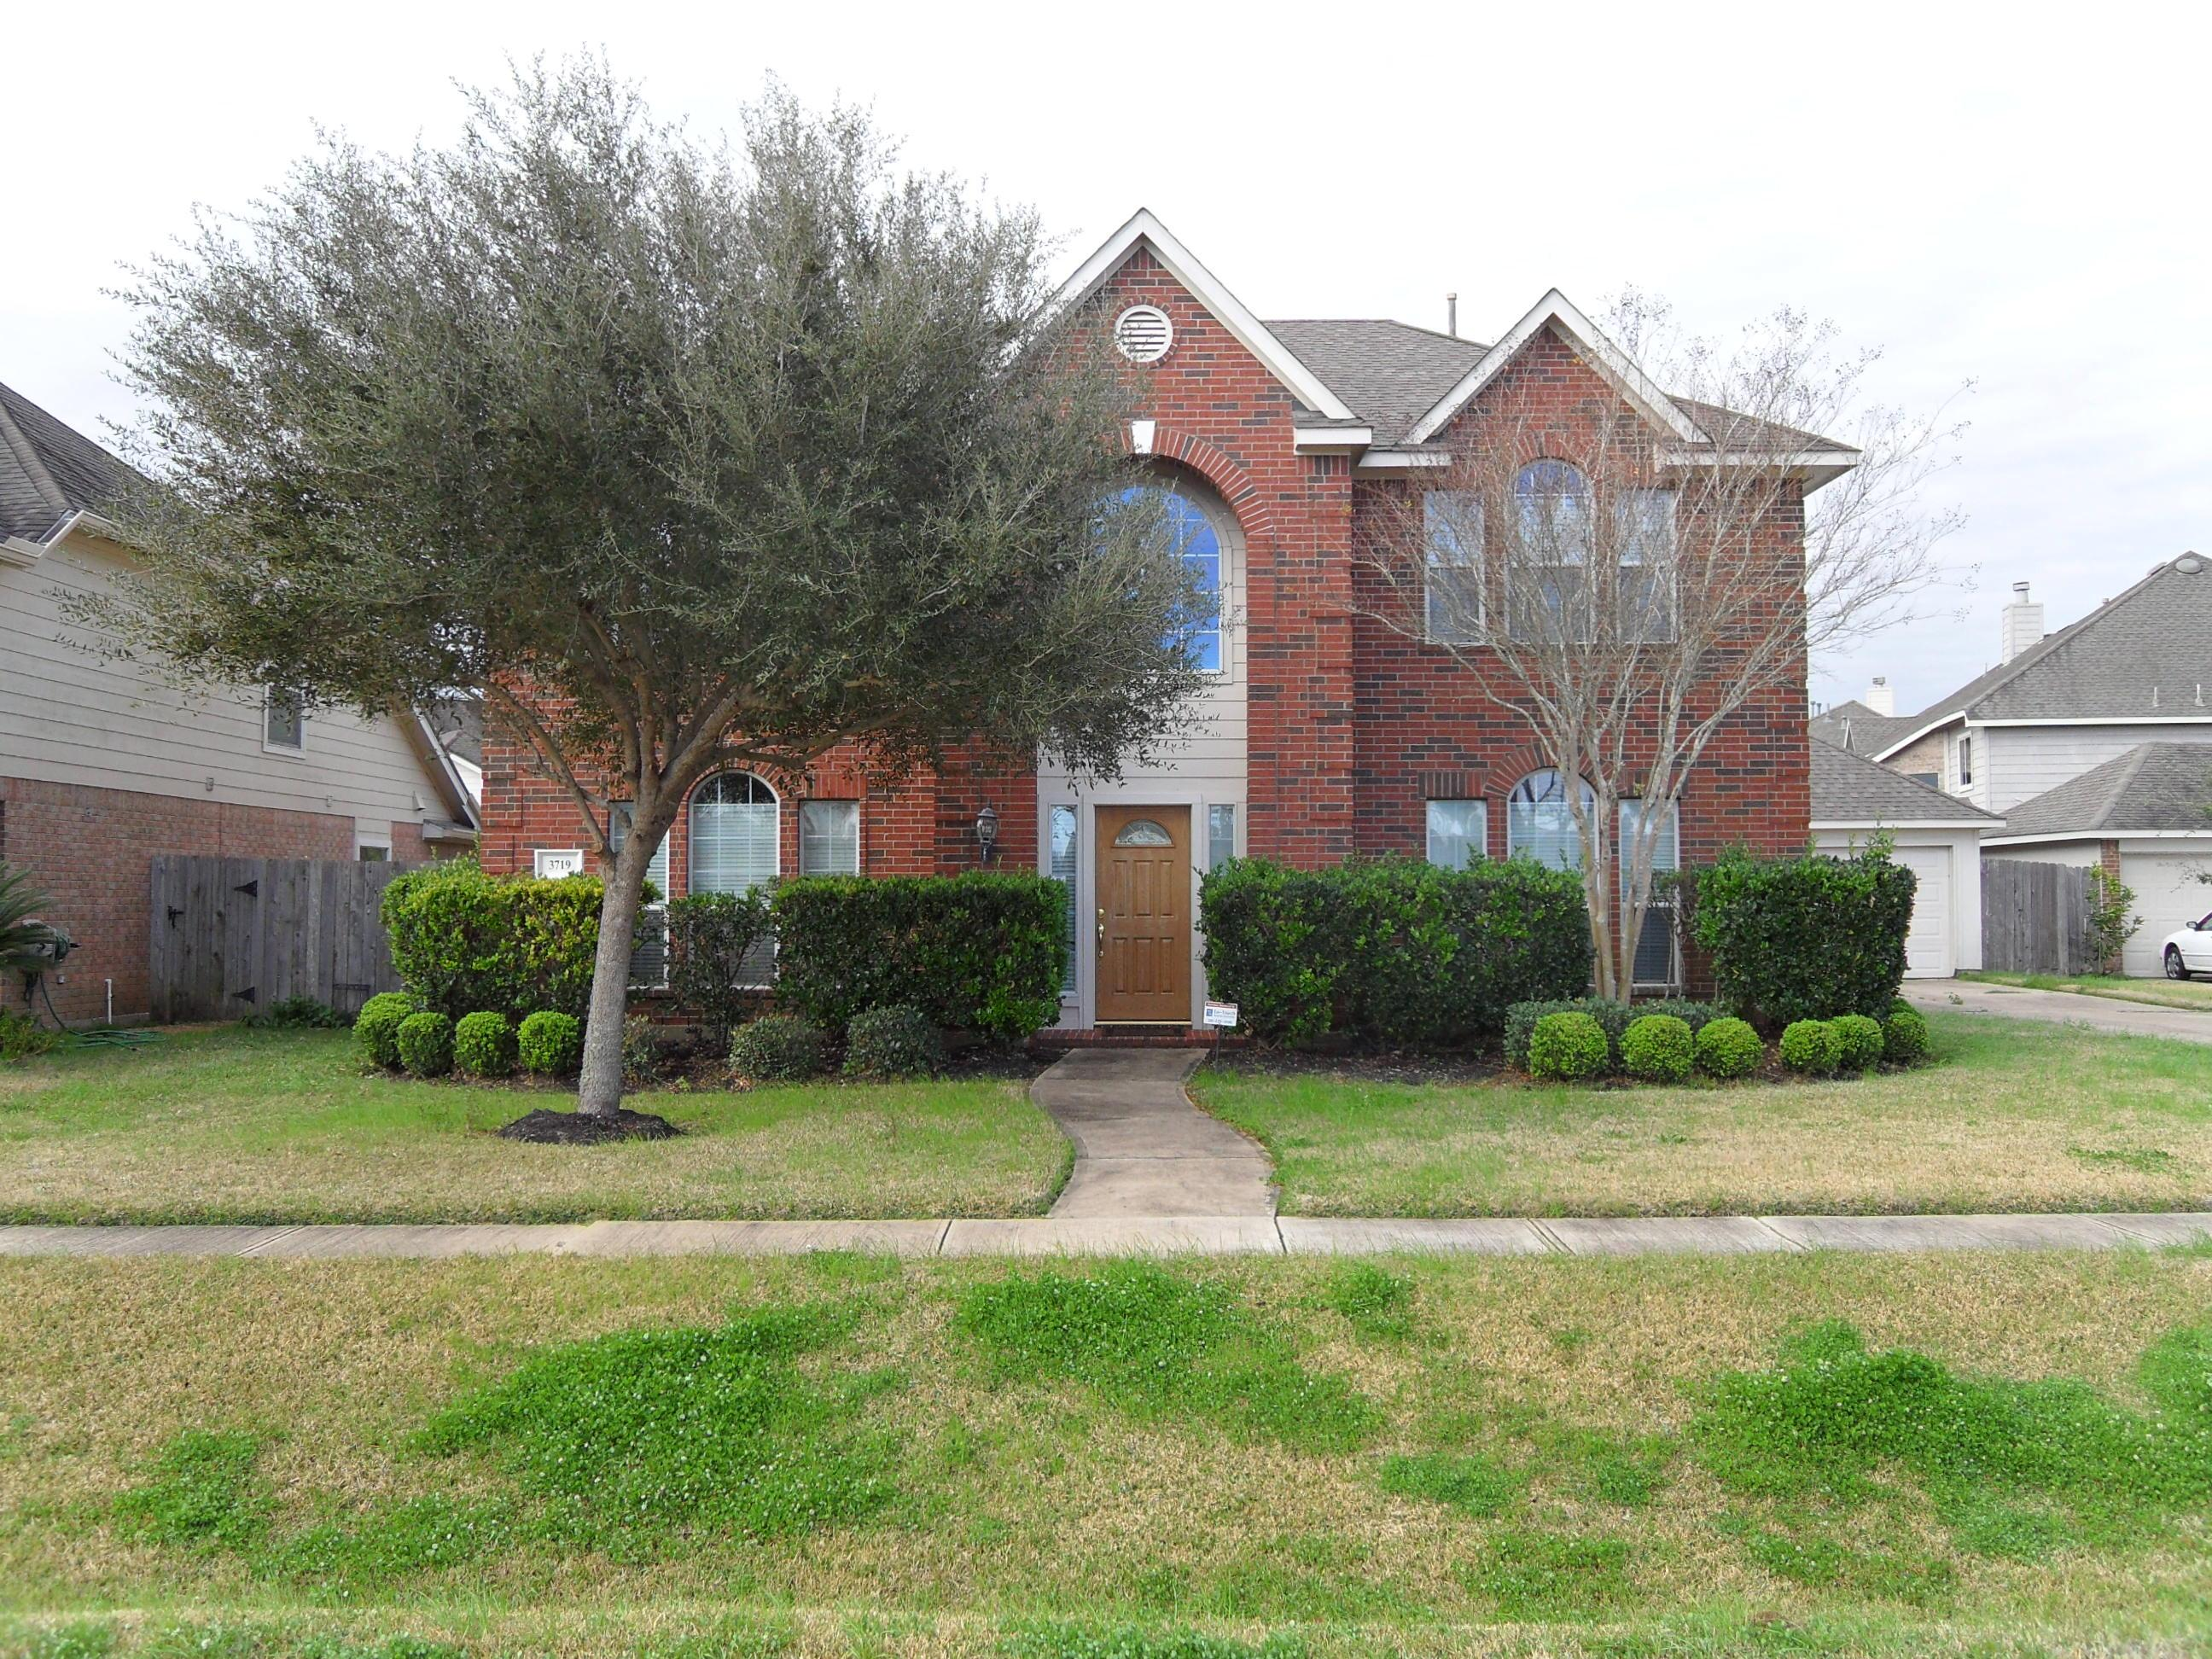 missouri city tx 77459 cheap houses for sale missouri city texas property listings page 1